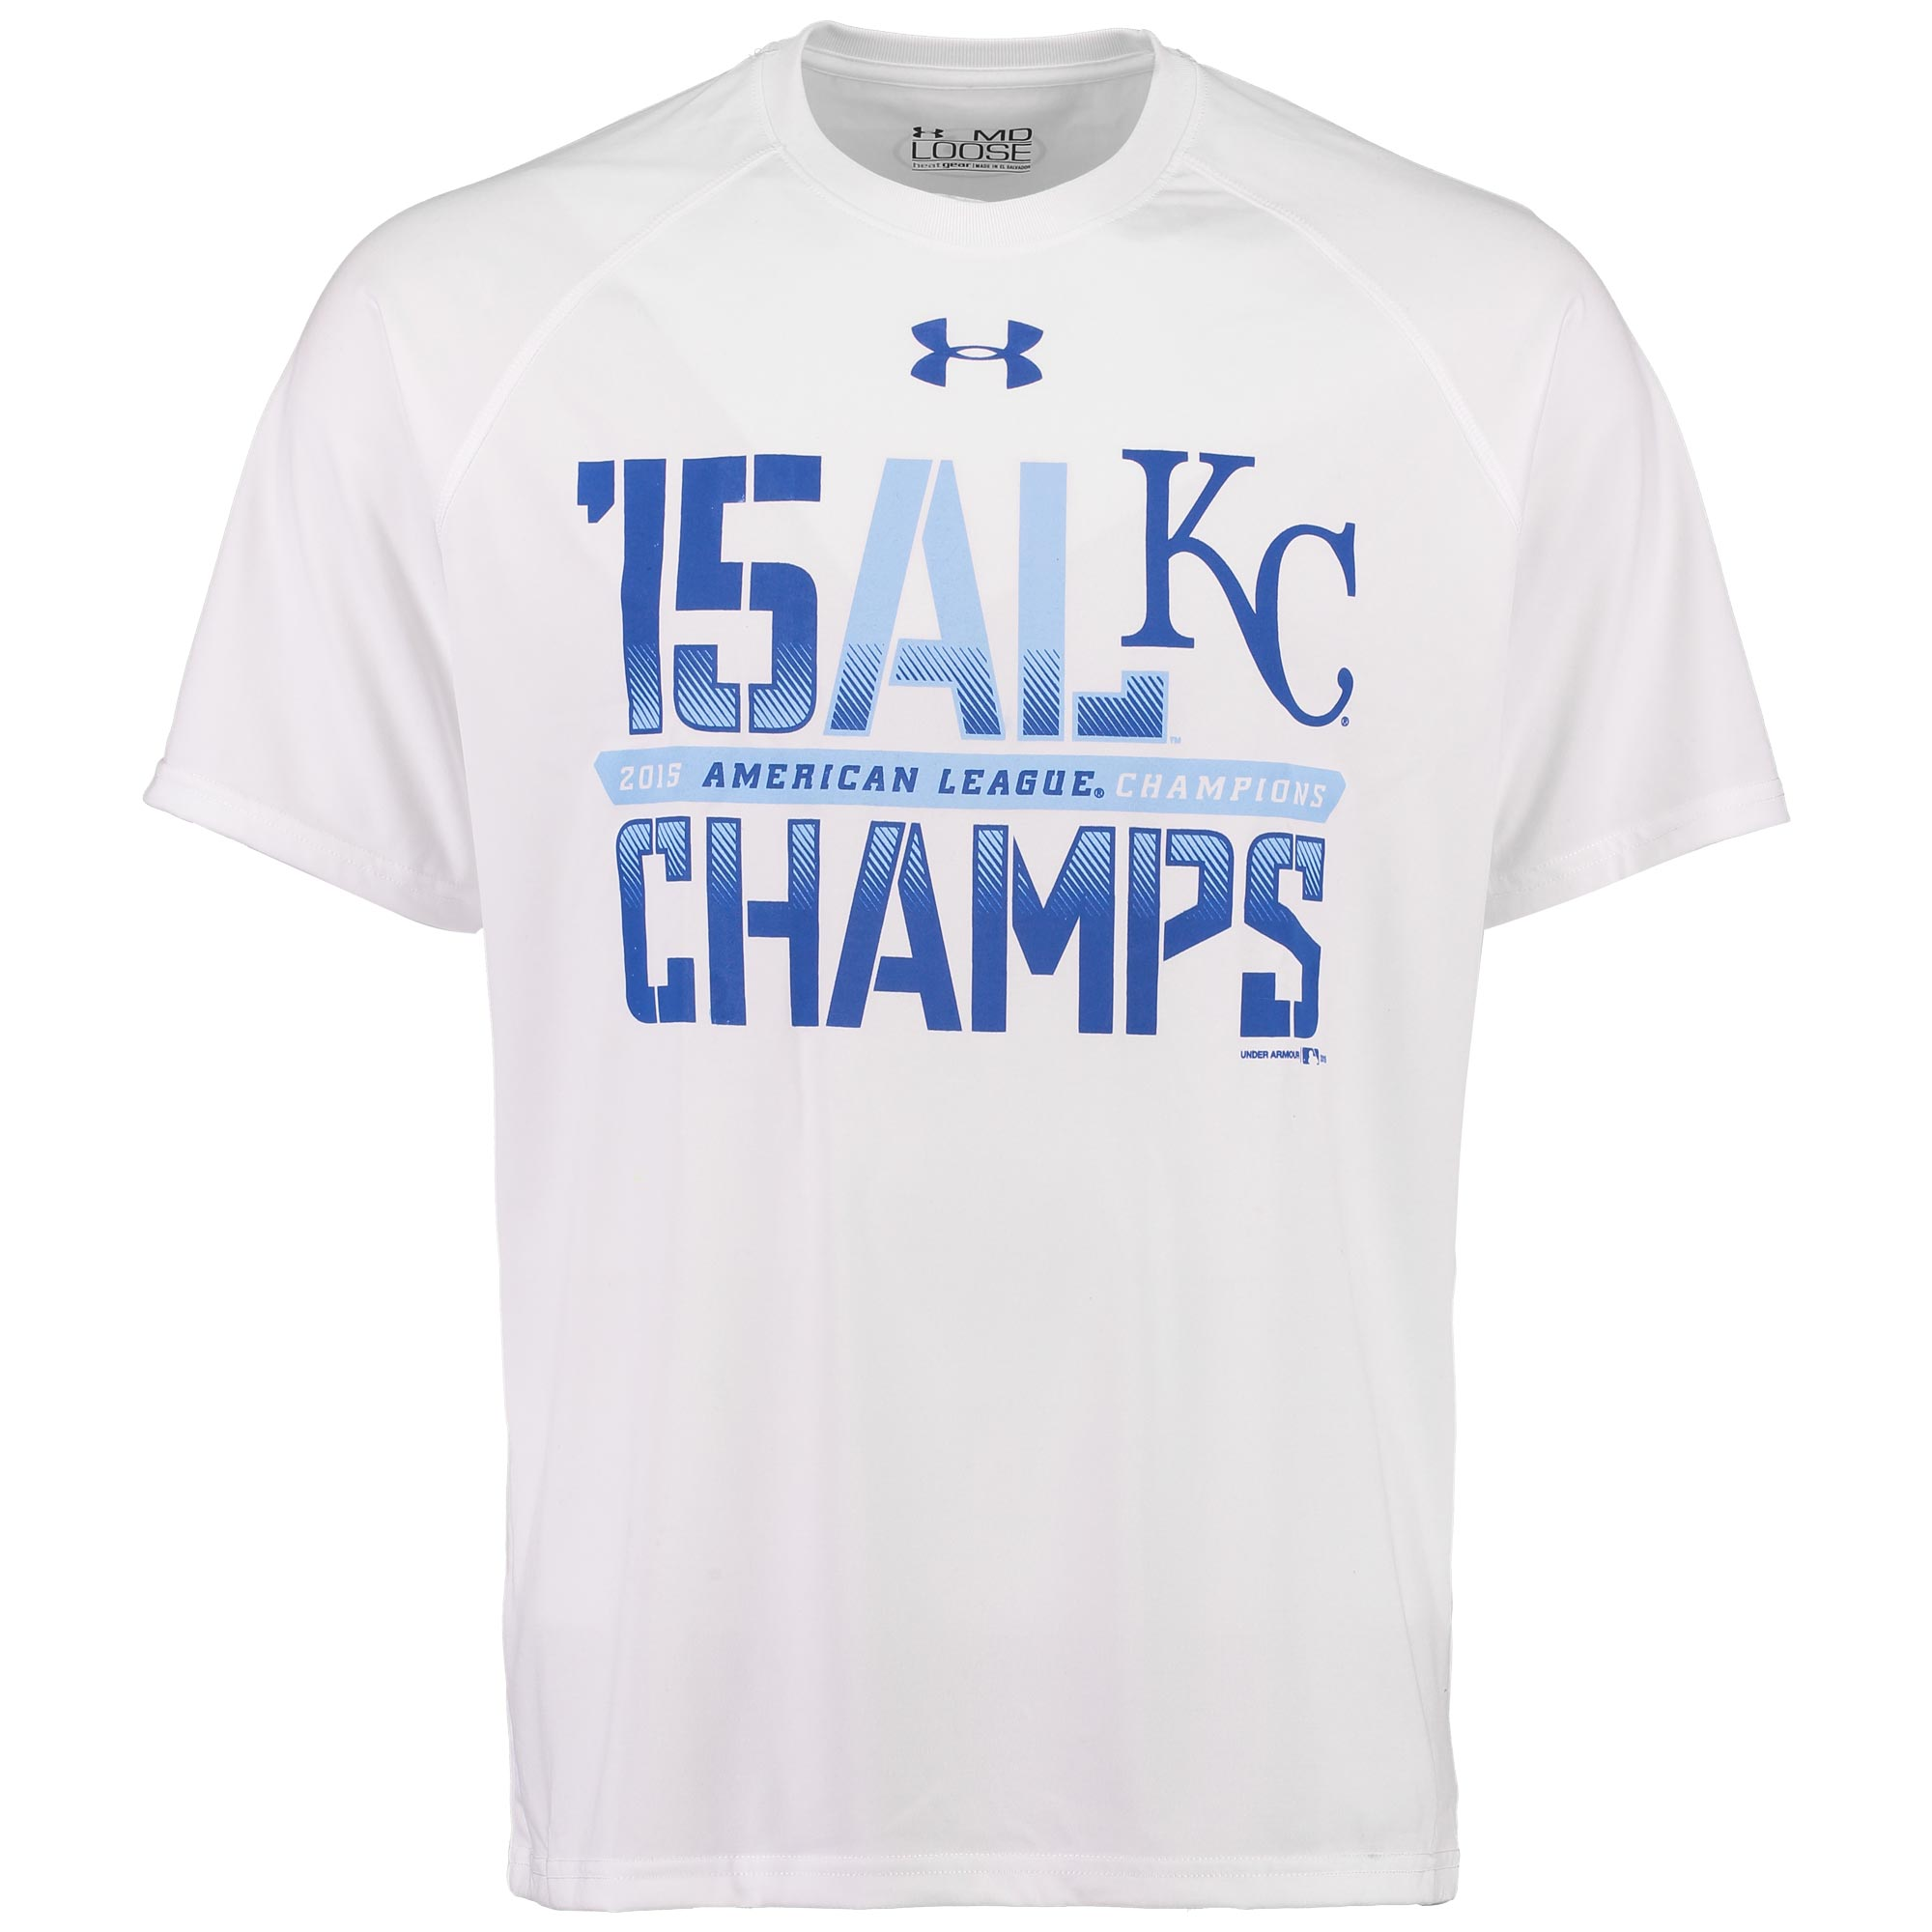 Kansas City Royals Under Armour 2015 American League Champions Performance T-Shirt - White